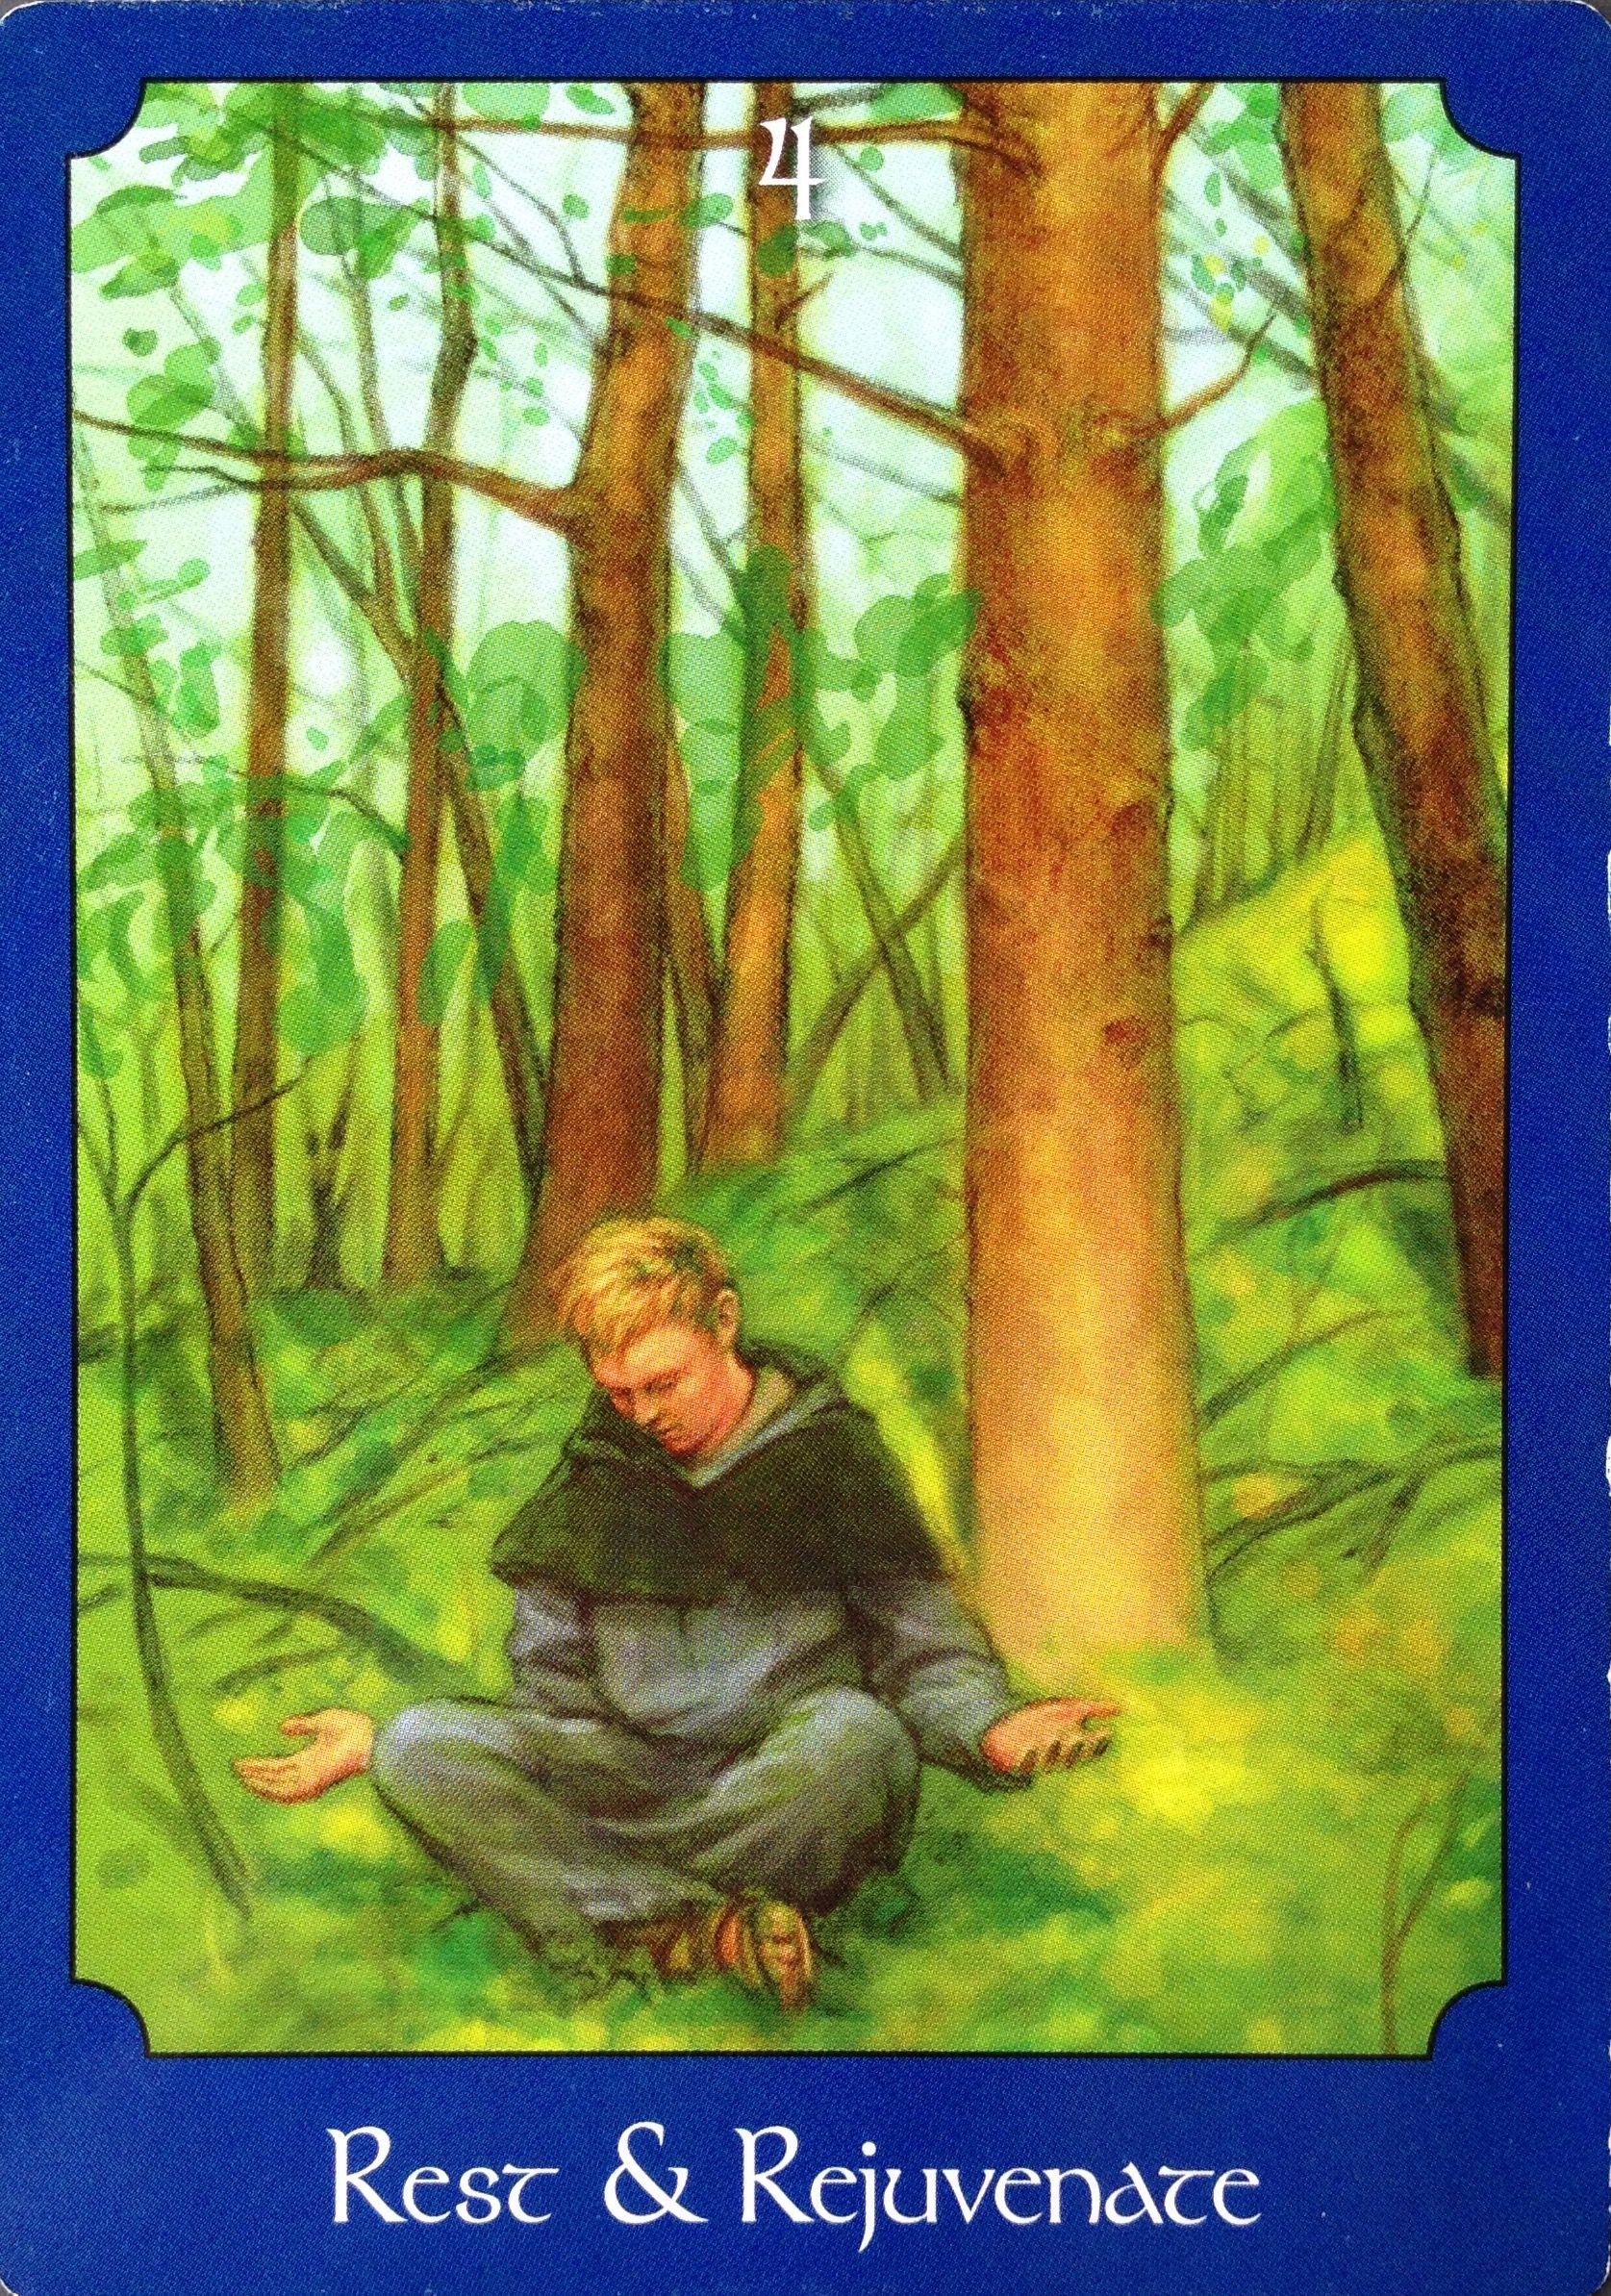 28 april 2015 dailycardreading psychicreading